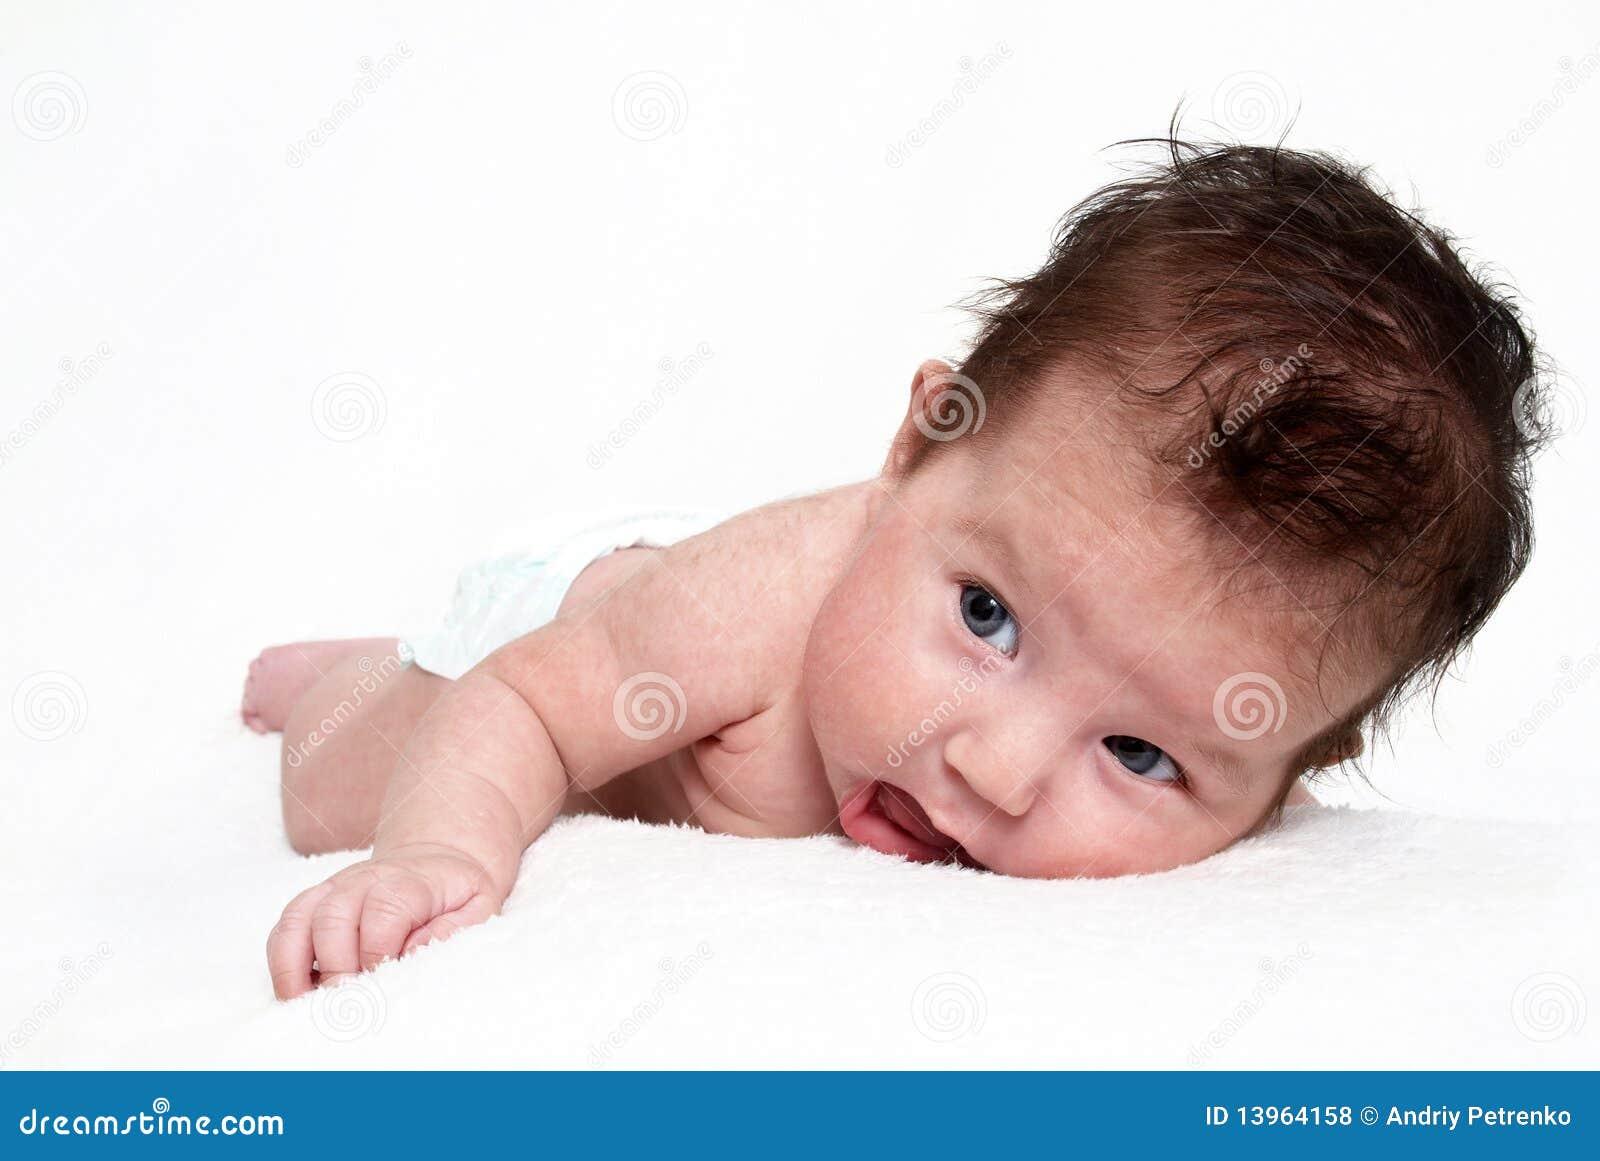 Newborn baby taken closeup